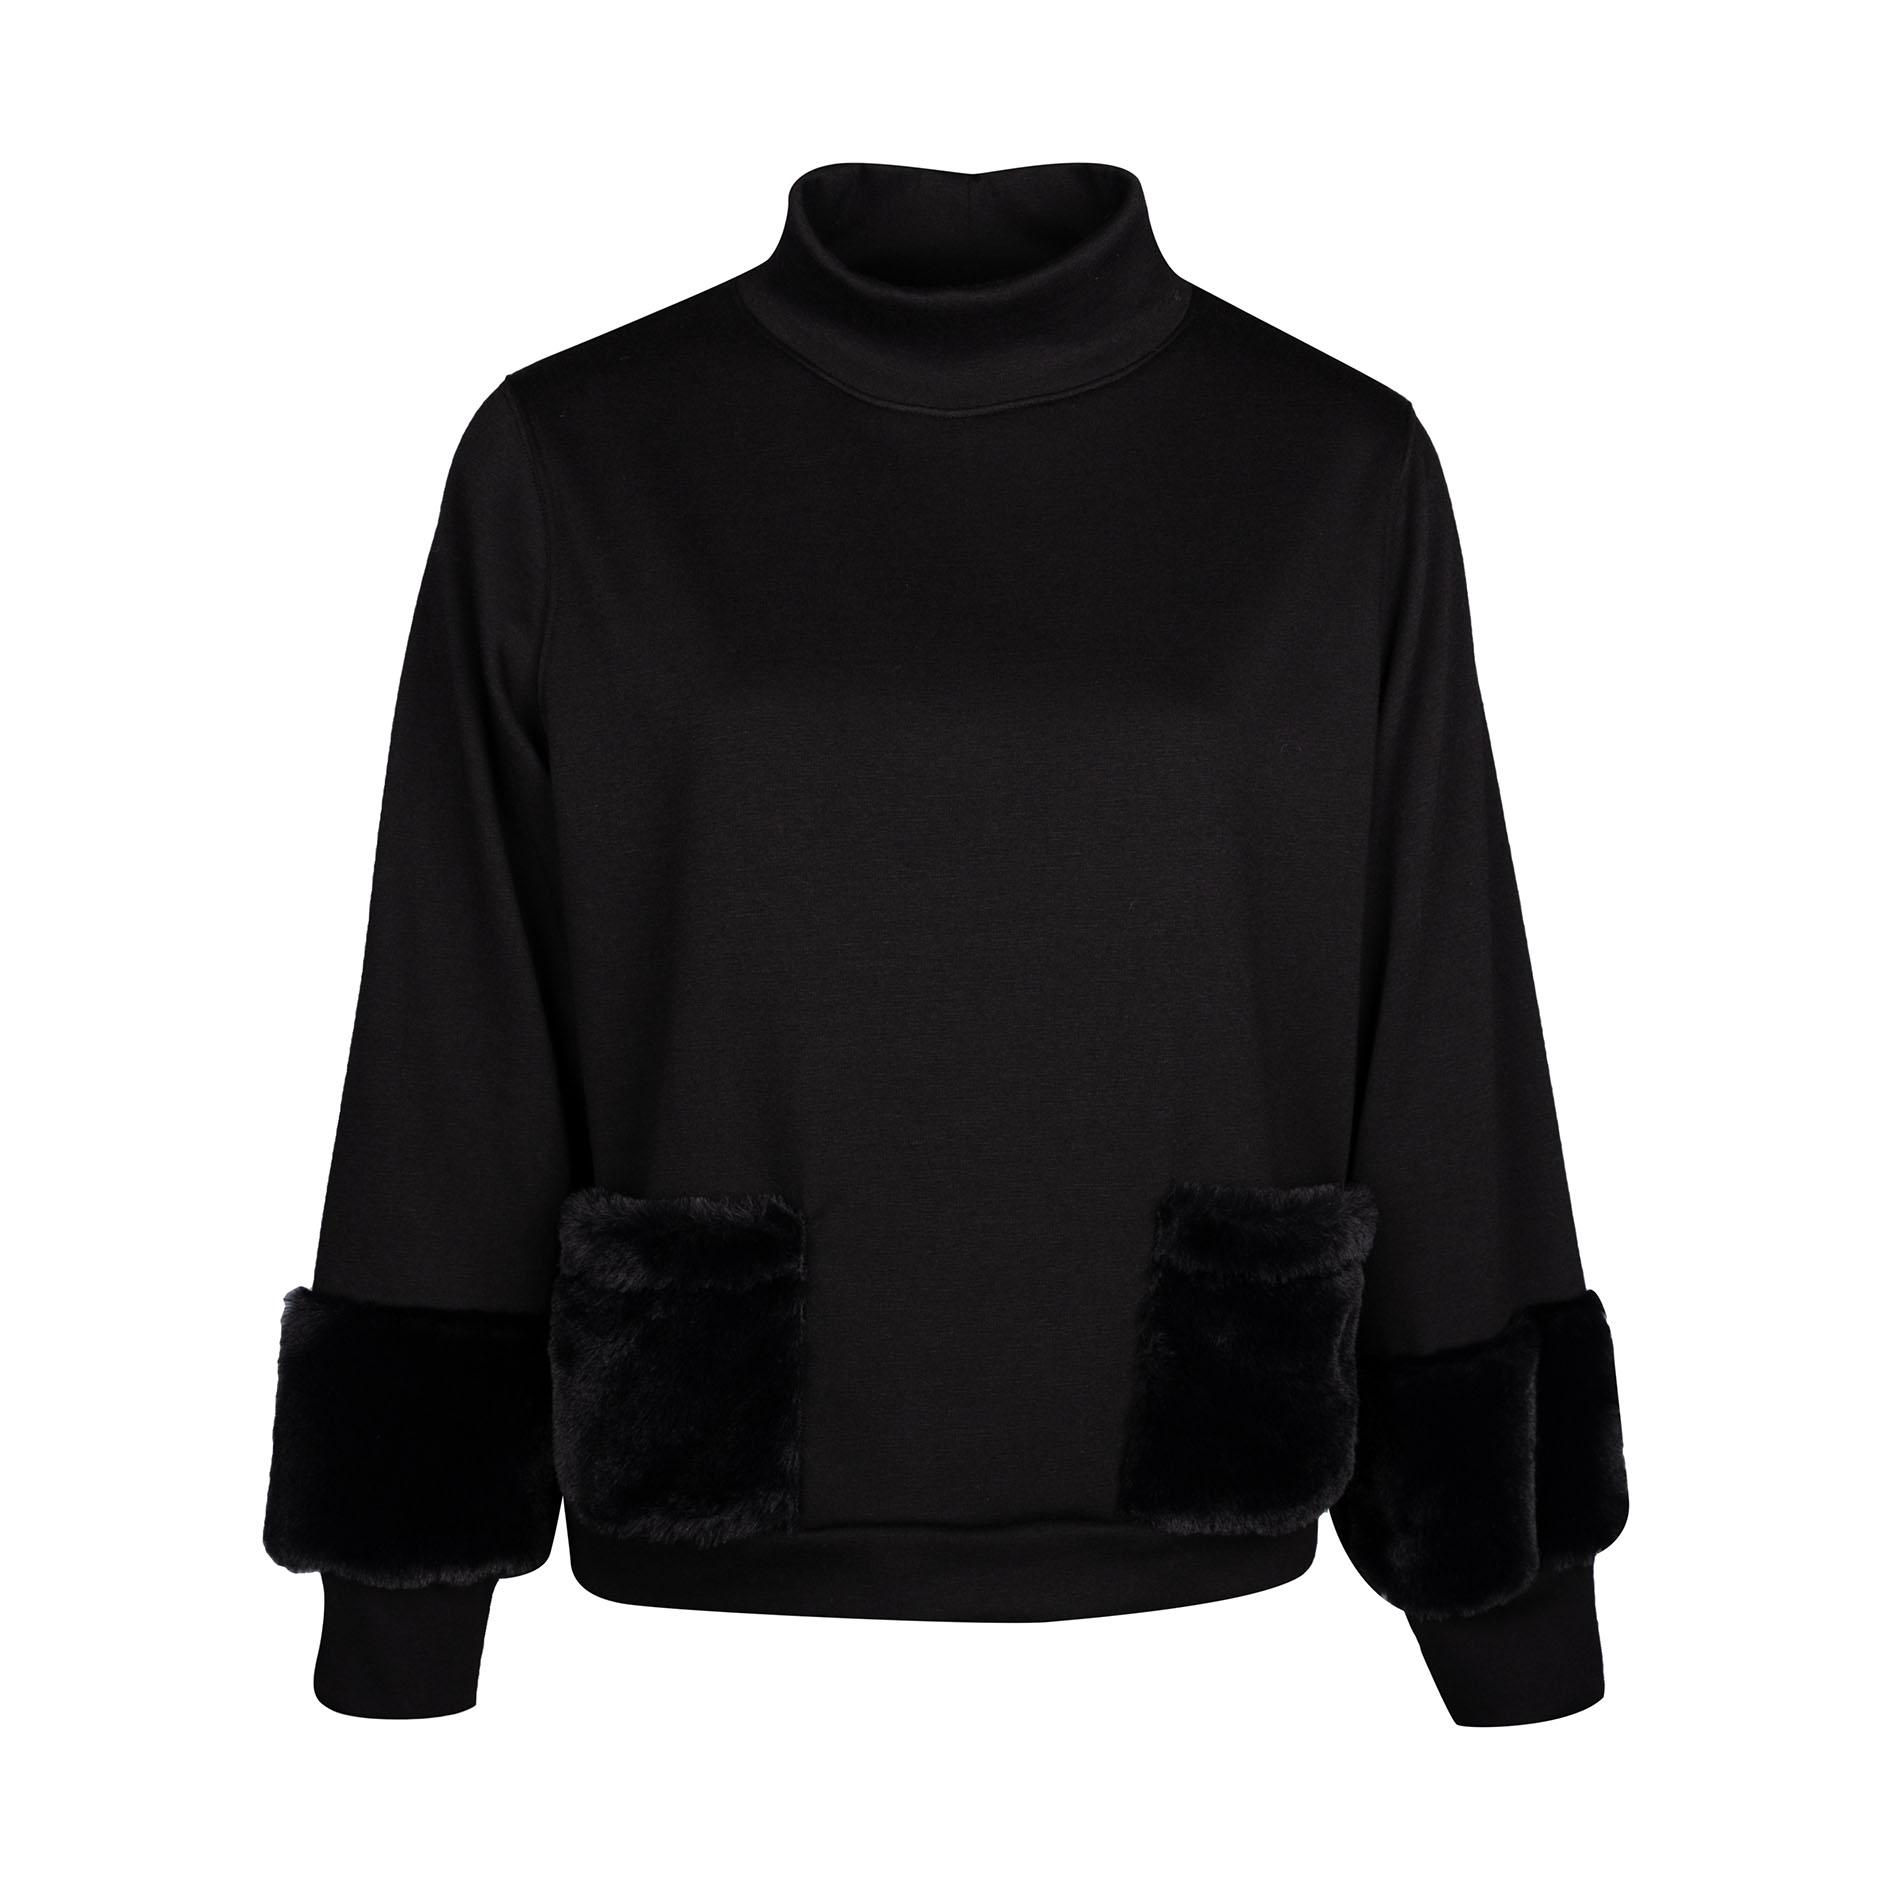 Sweater 'Pirelli' Black